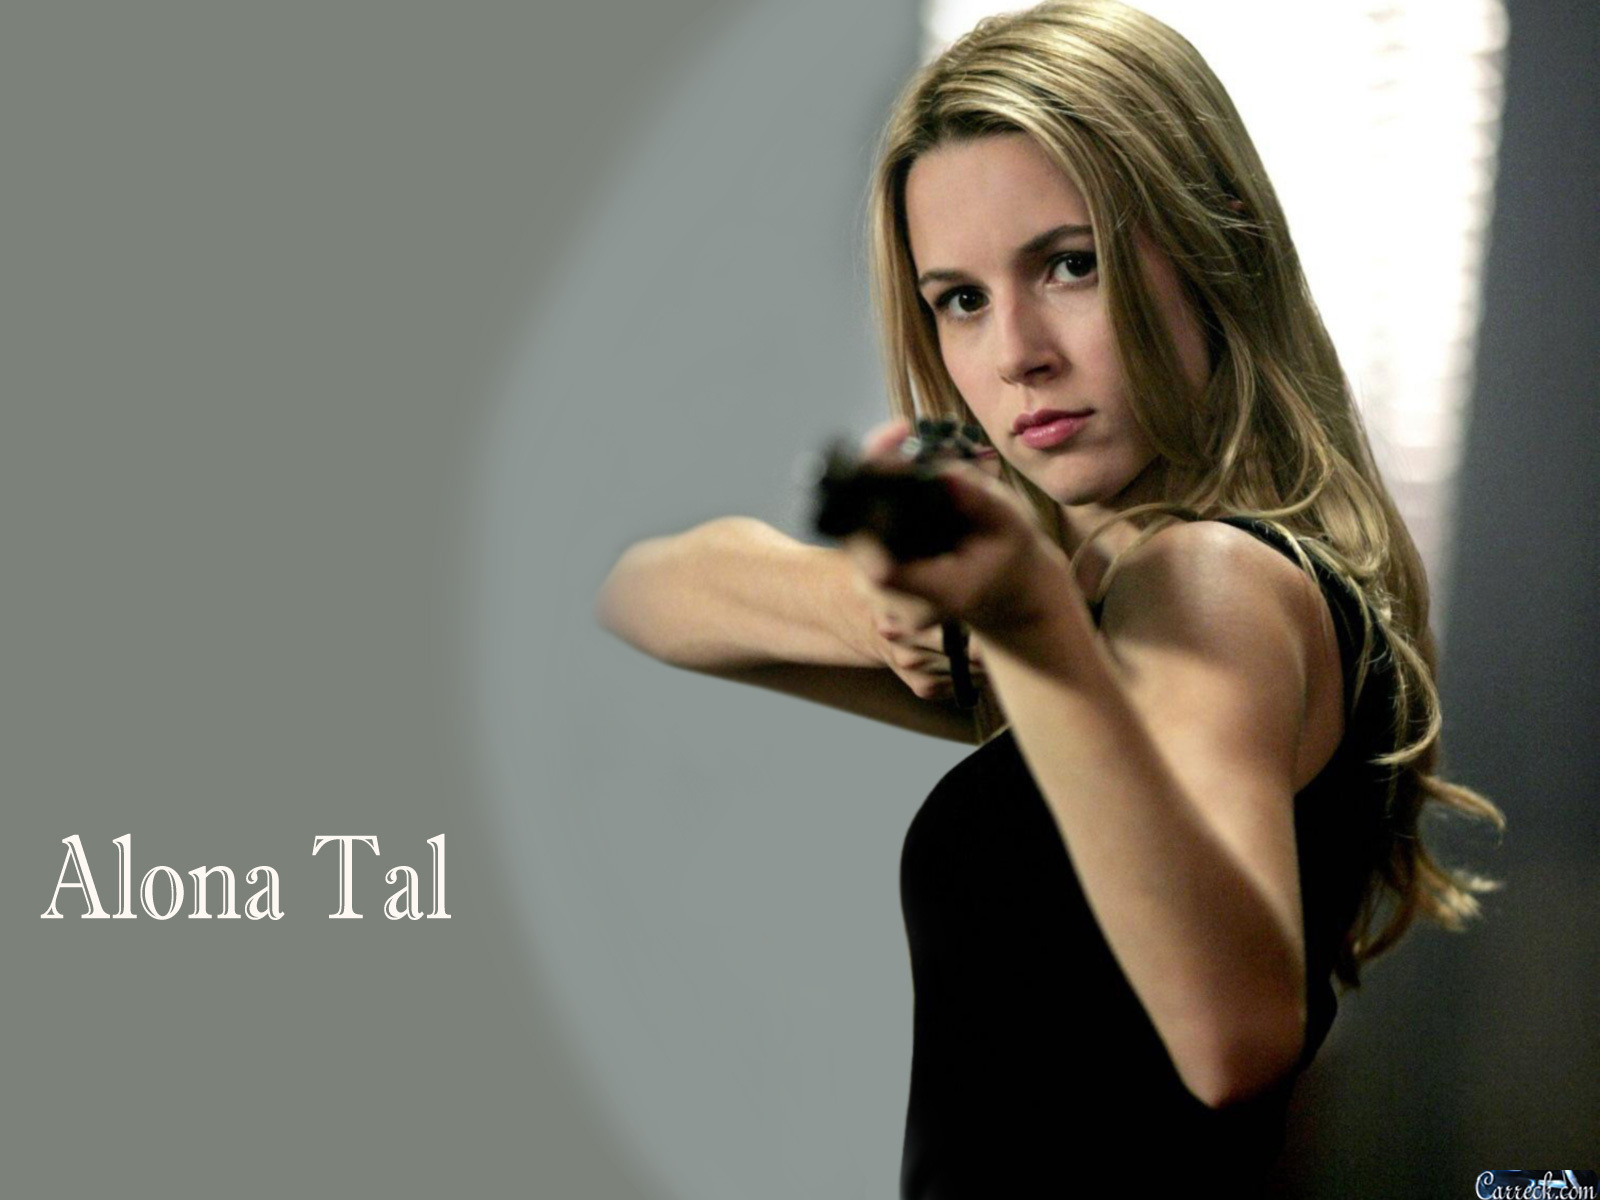 Alona Tal Photos